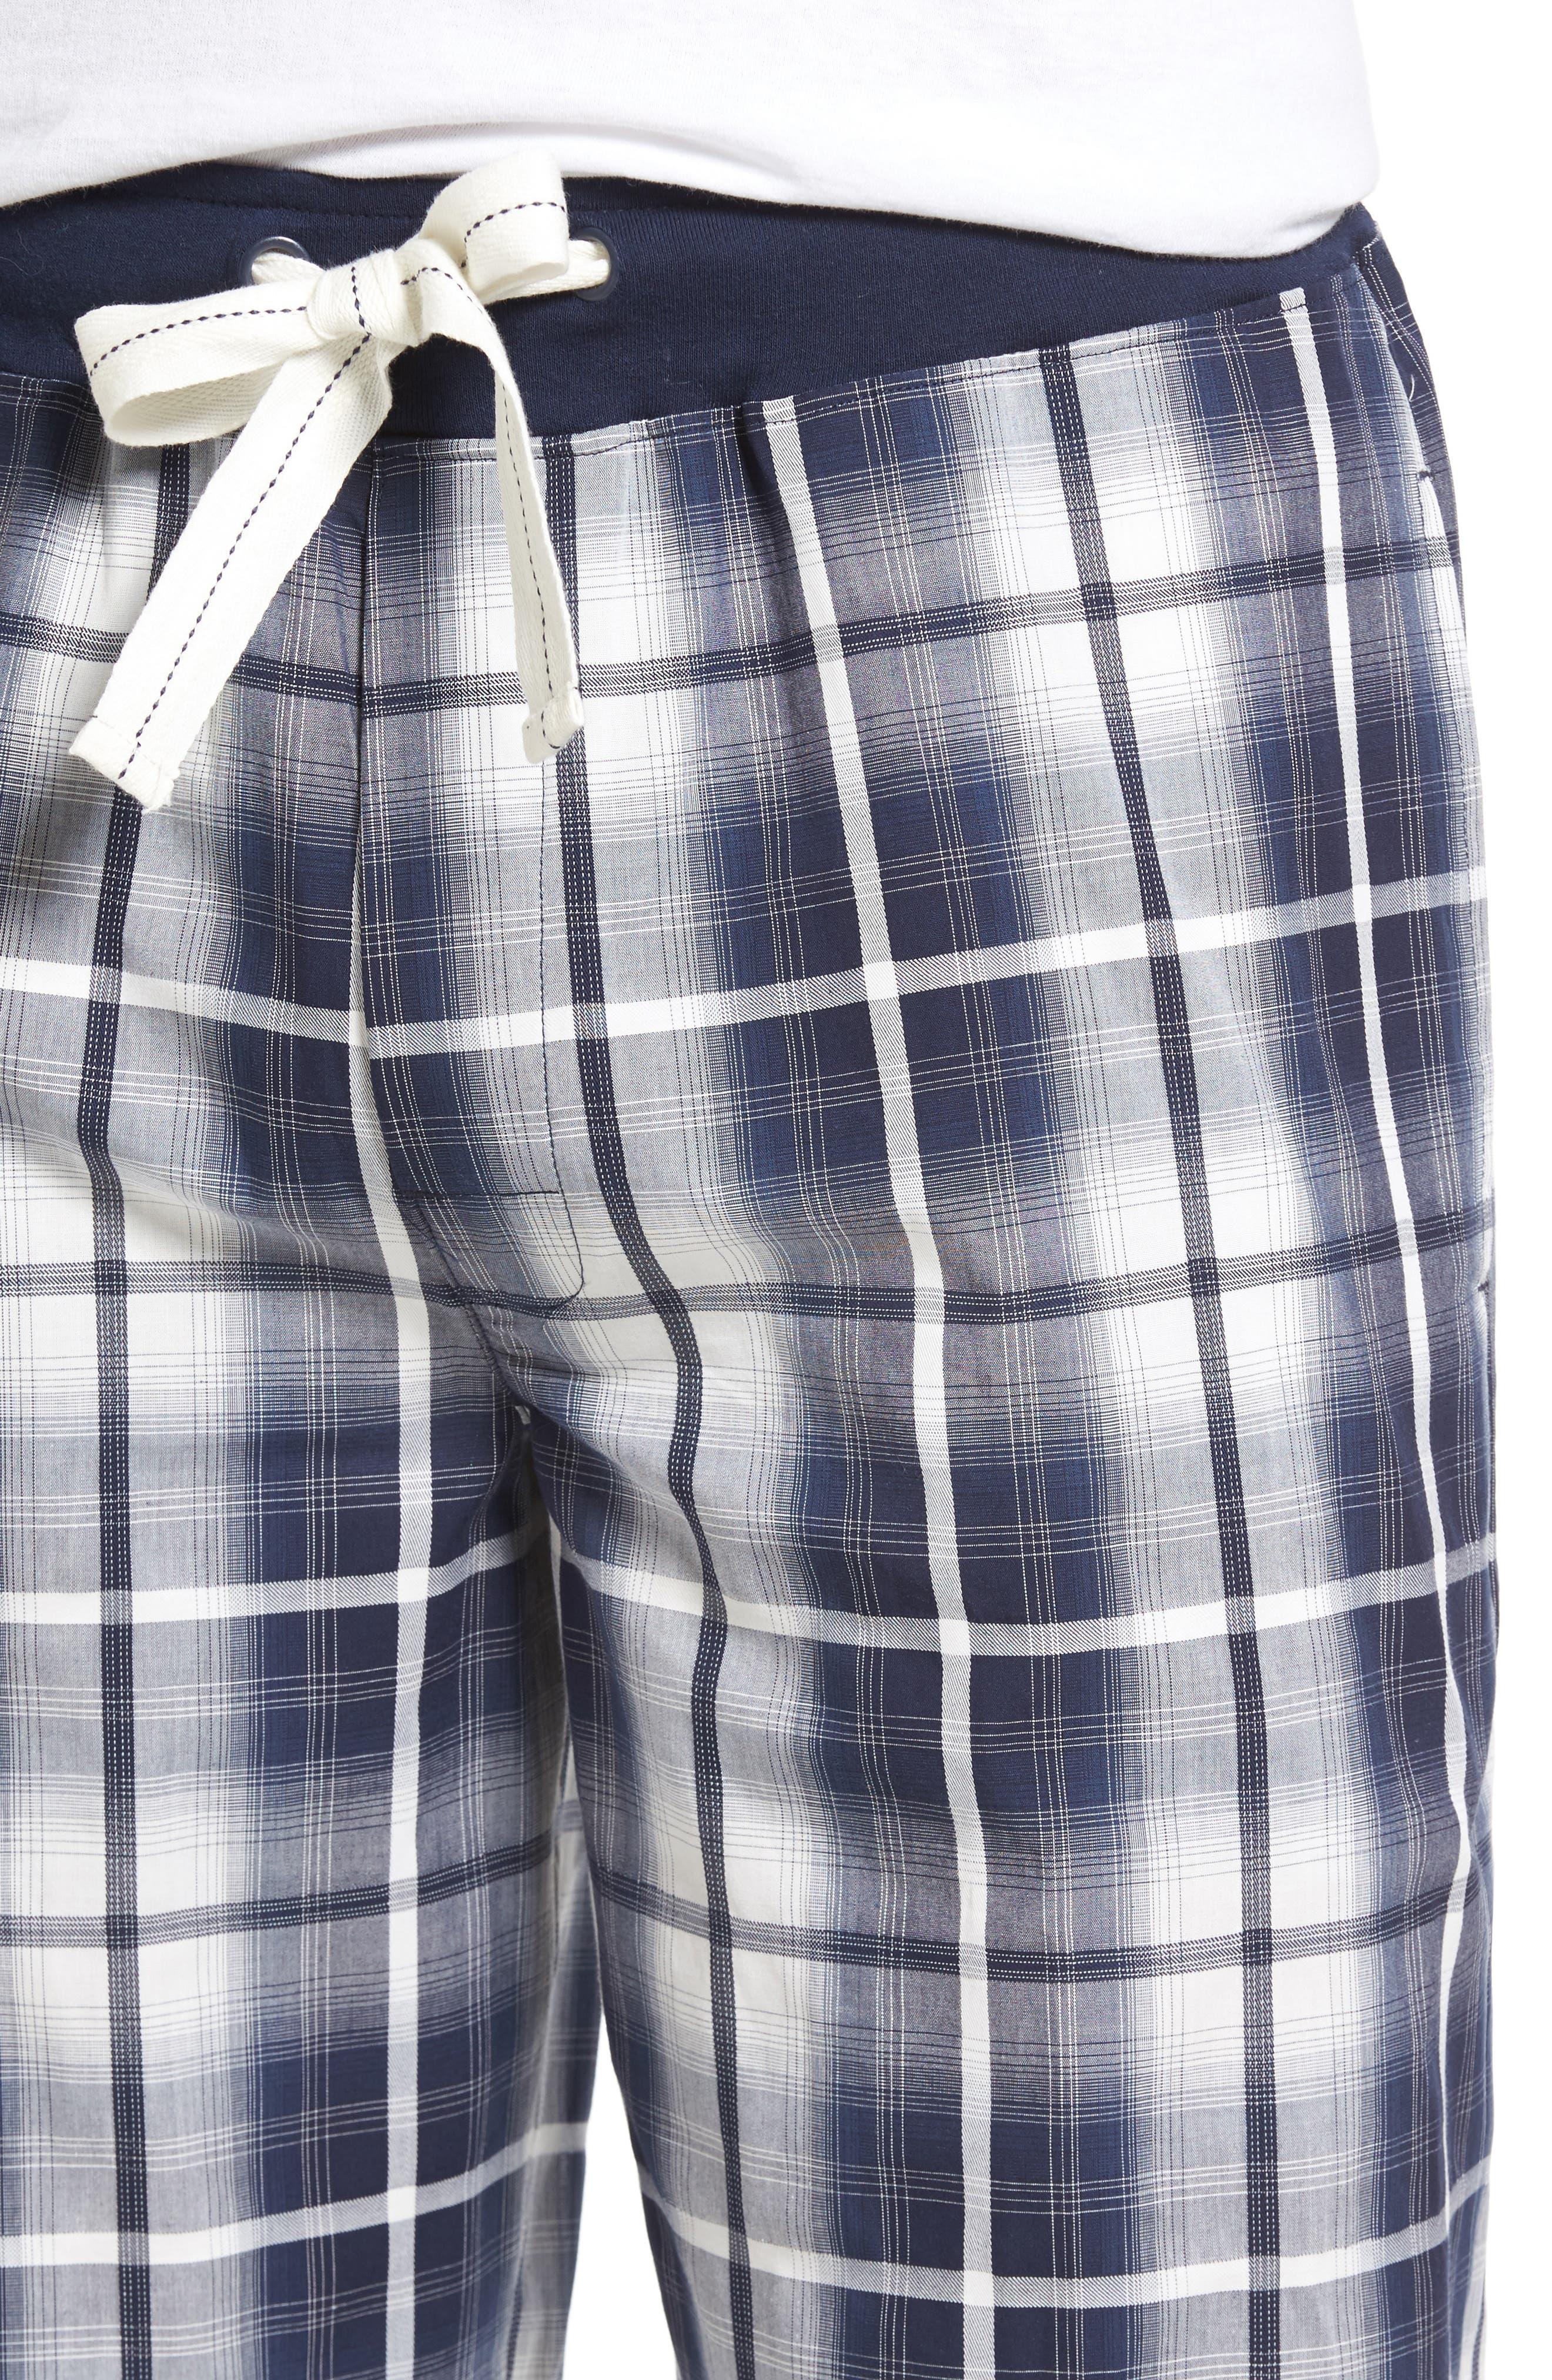 Mad 4 Plaid Lounge Pants,                             Alternate thumbnail 4, color,                             410